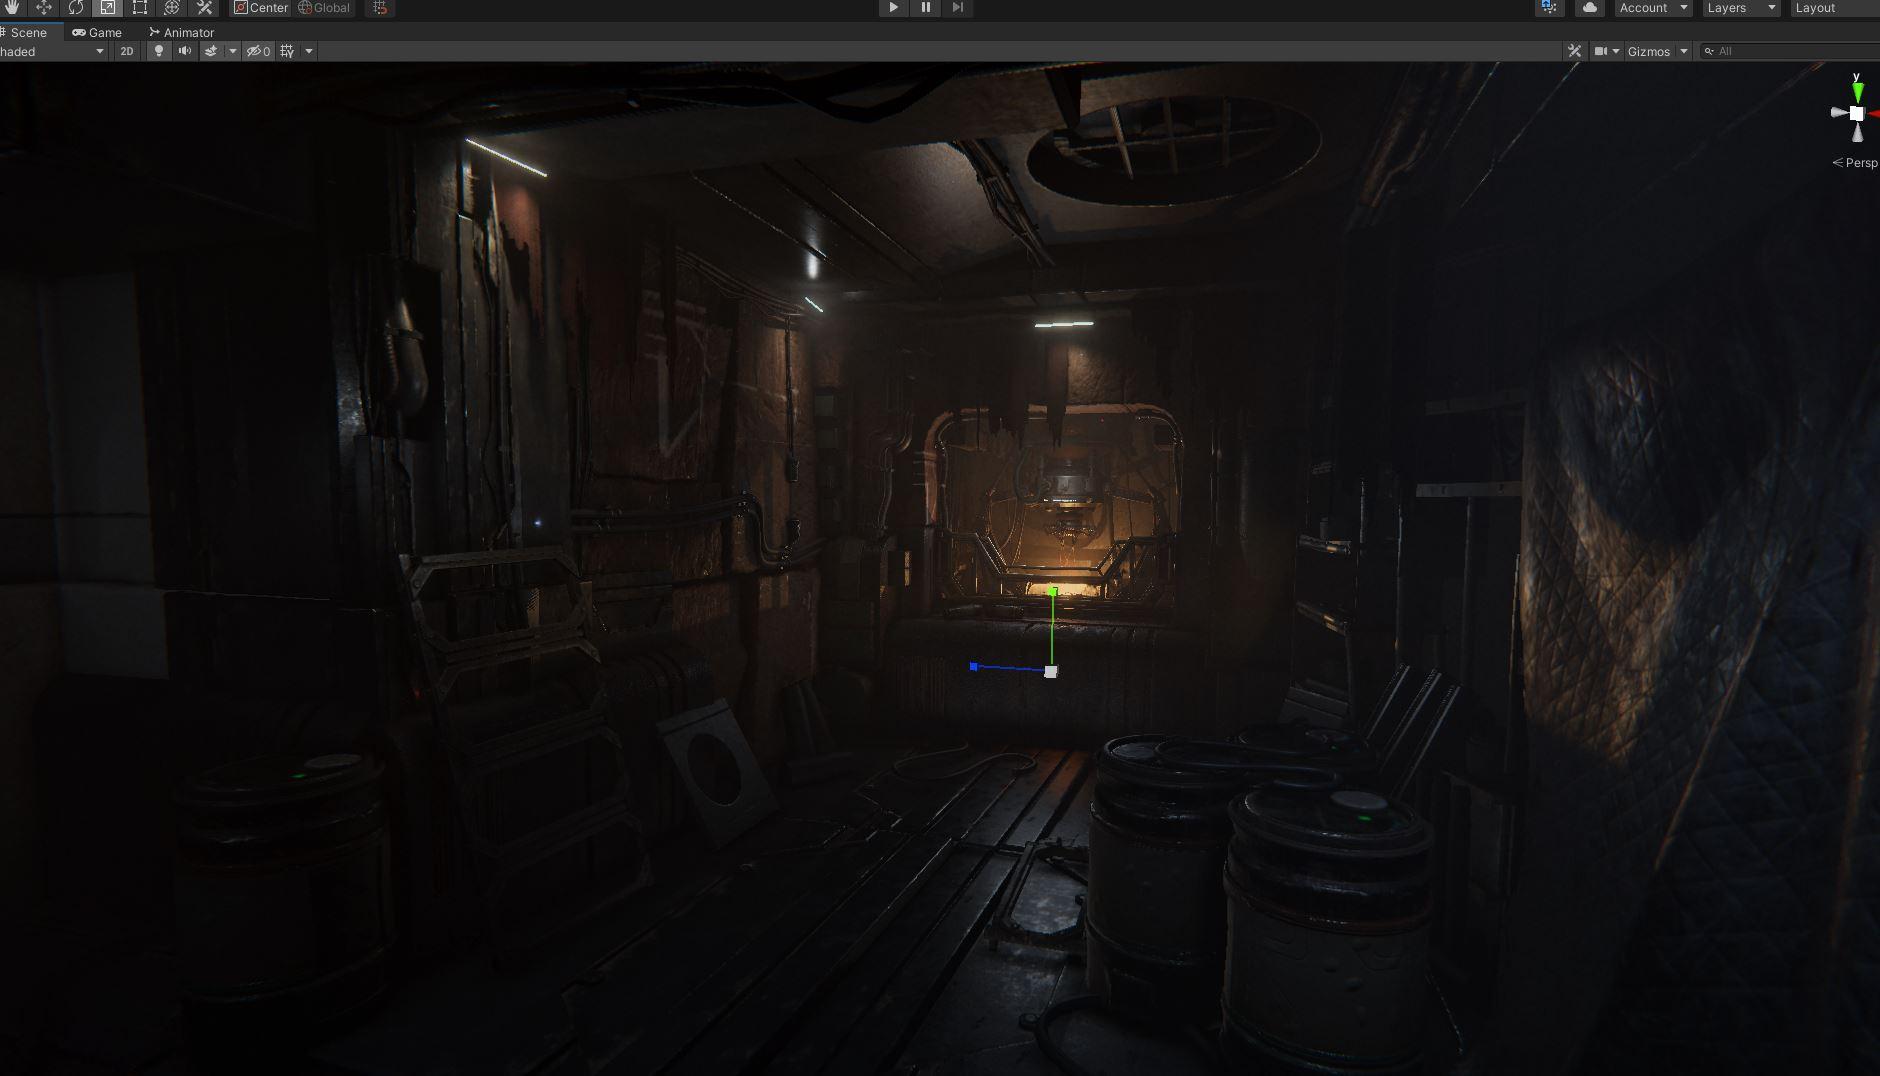 scrn | Dust Chamber : Бесконечная Структура, пыль, спуск в бездну